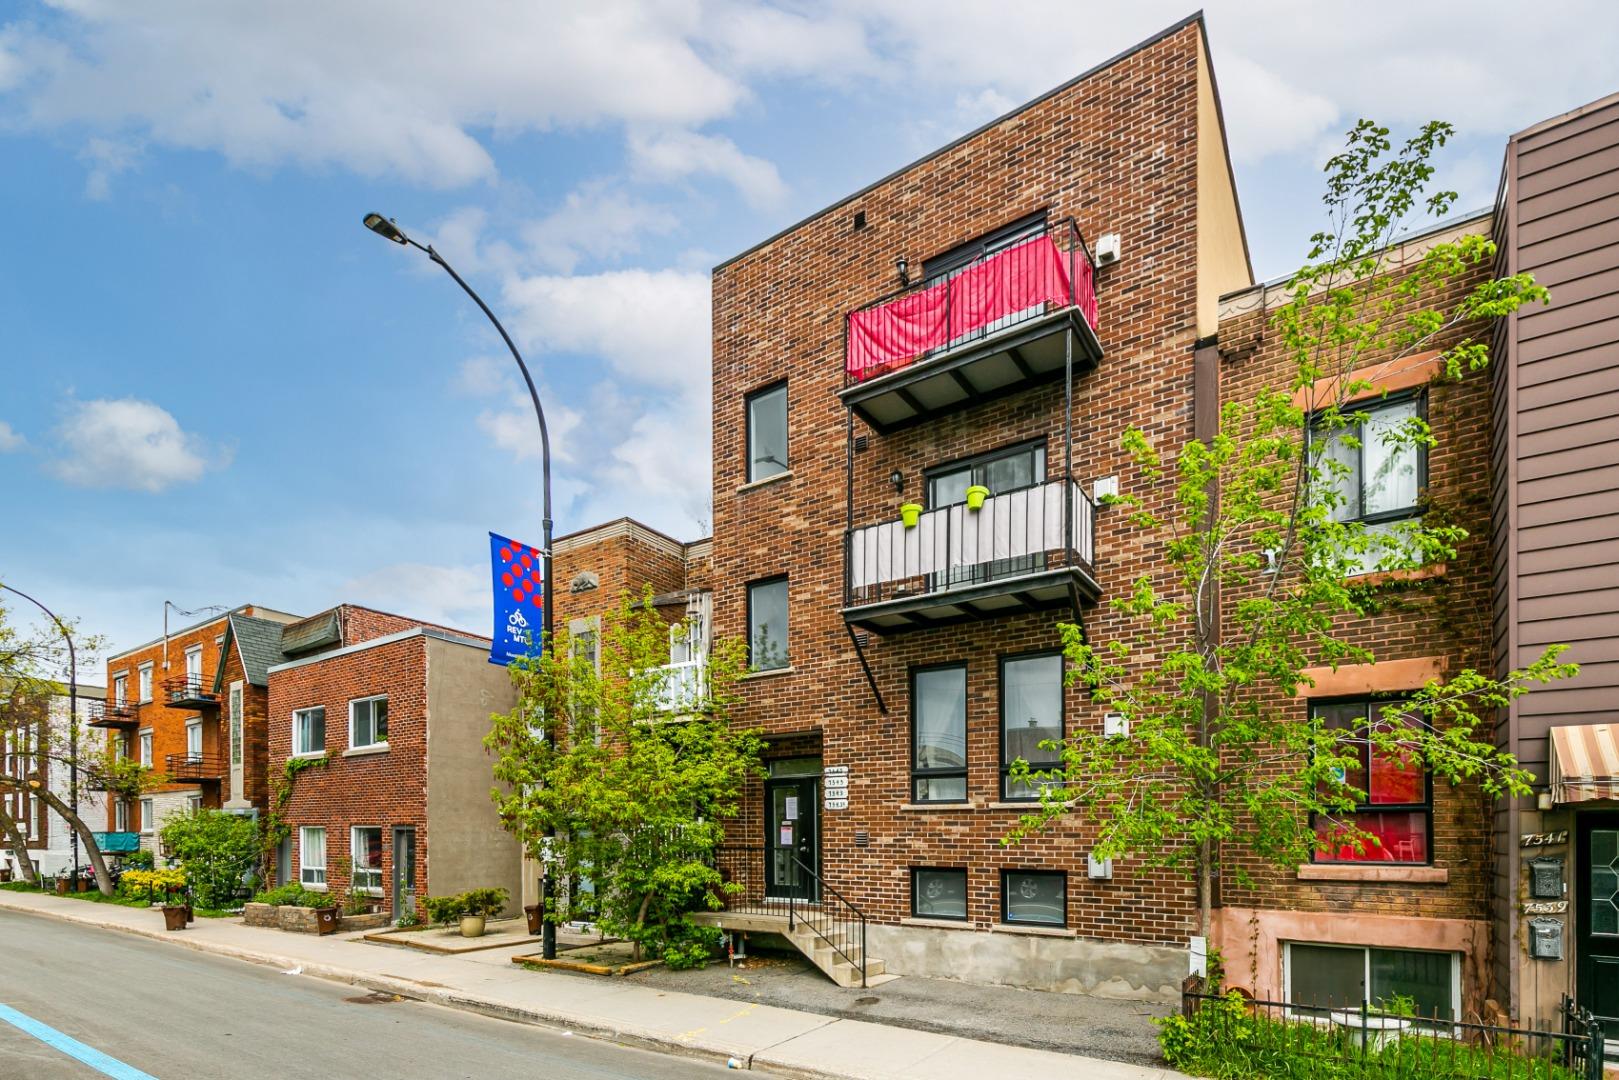 Condo à vendre Villeray 7547 Rue Lajeunesse (2).jpg